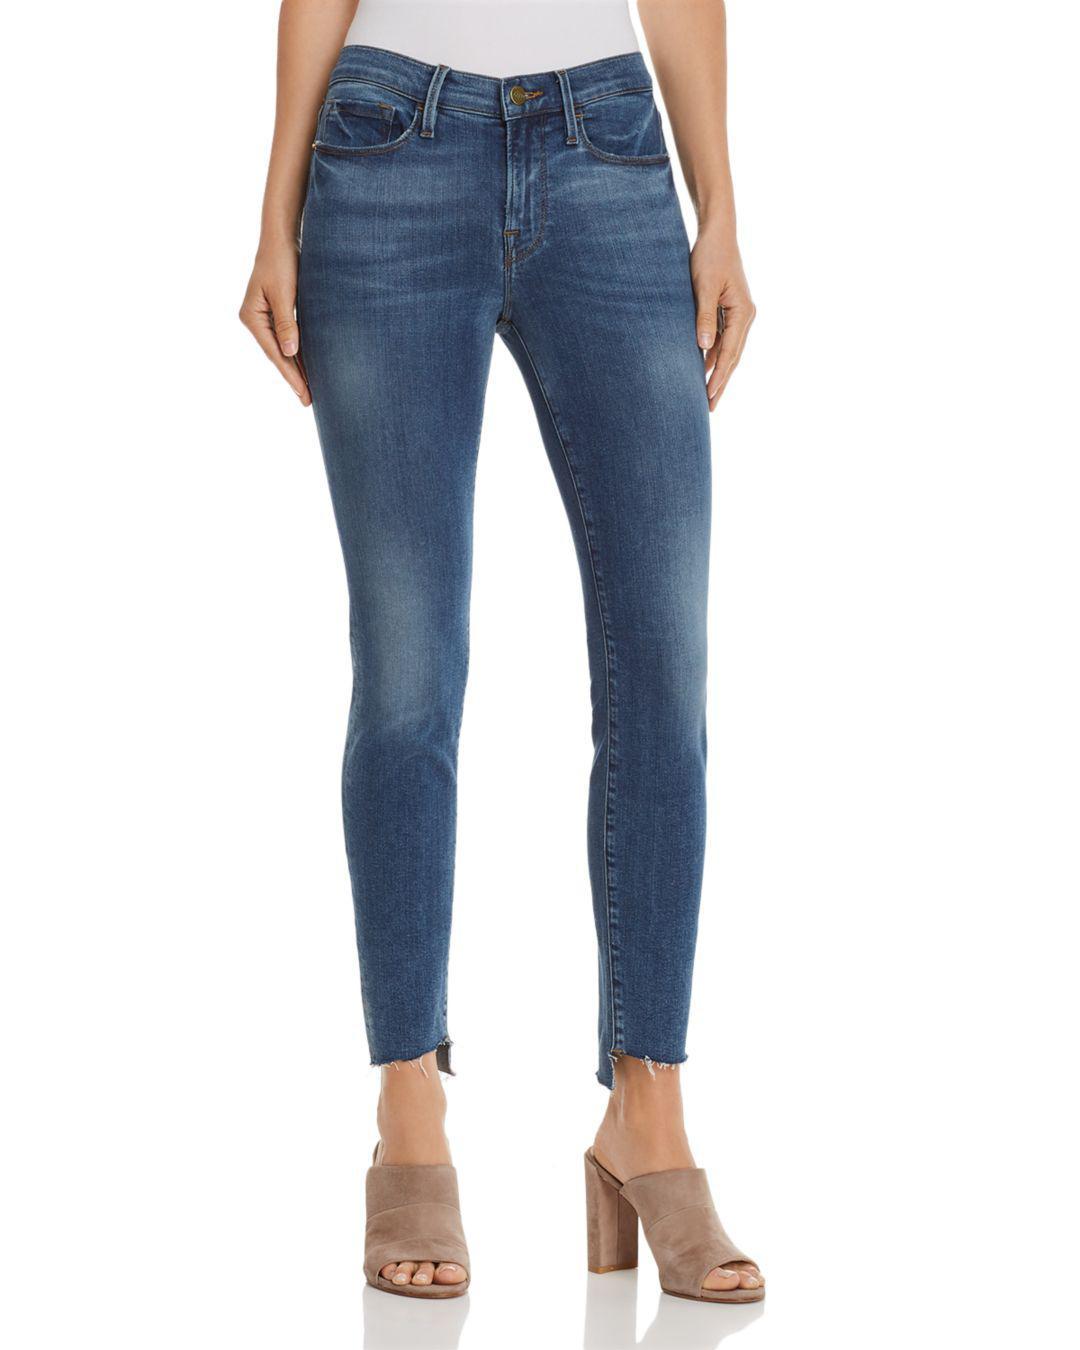 a8e279a8557a2 Lyst - FRAME Le Skinny De Jeanne Reverse Cascade Step-hem Jeans In ...